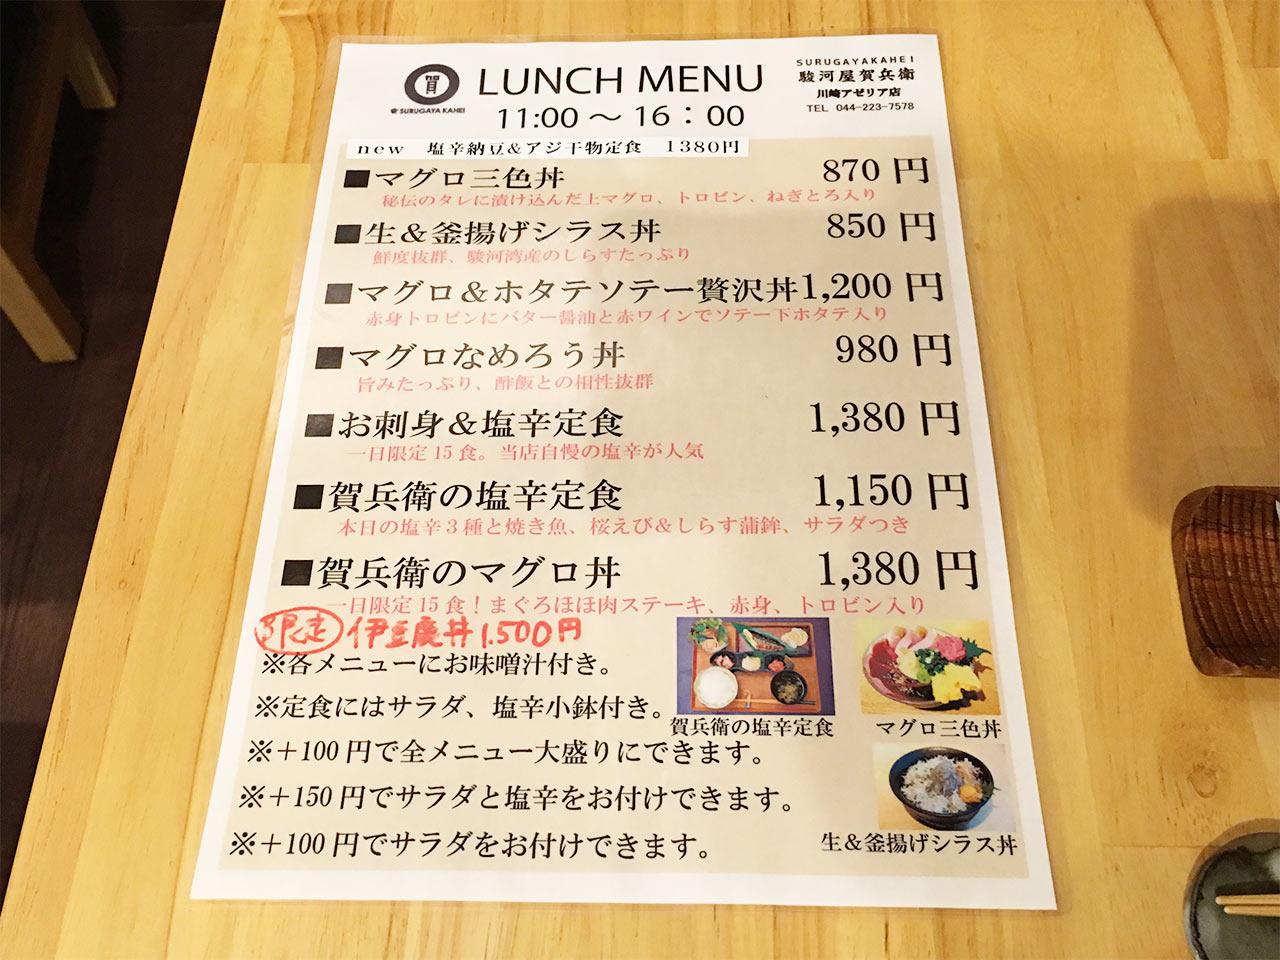 kawasaki-surugayakahei-menu01